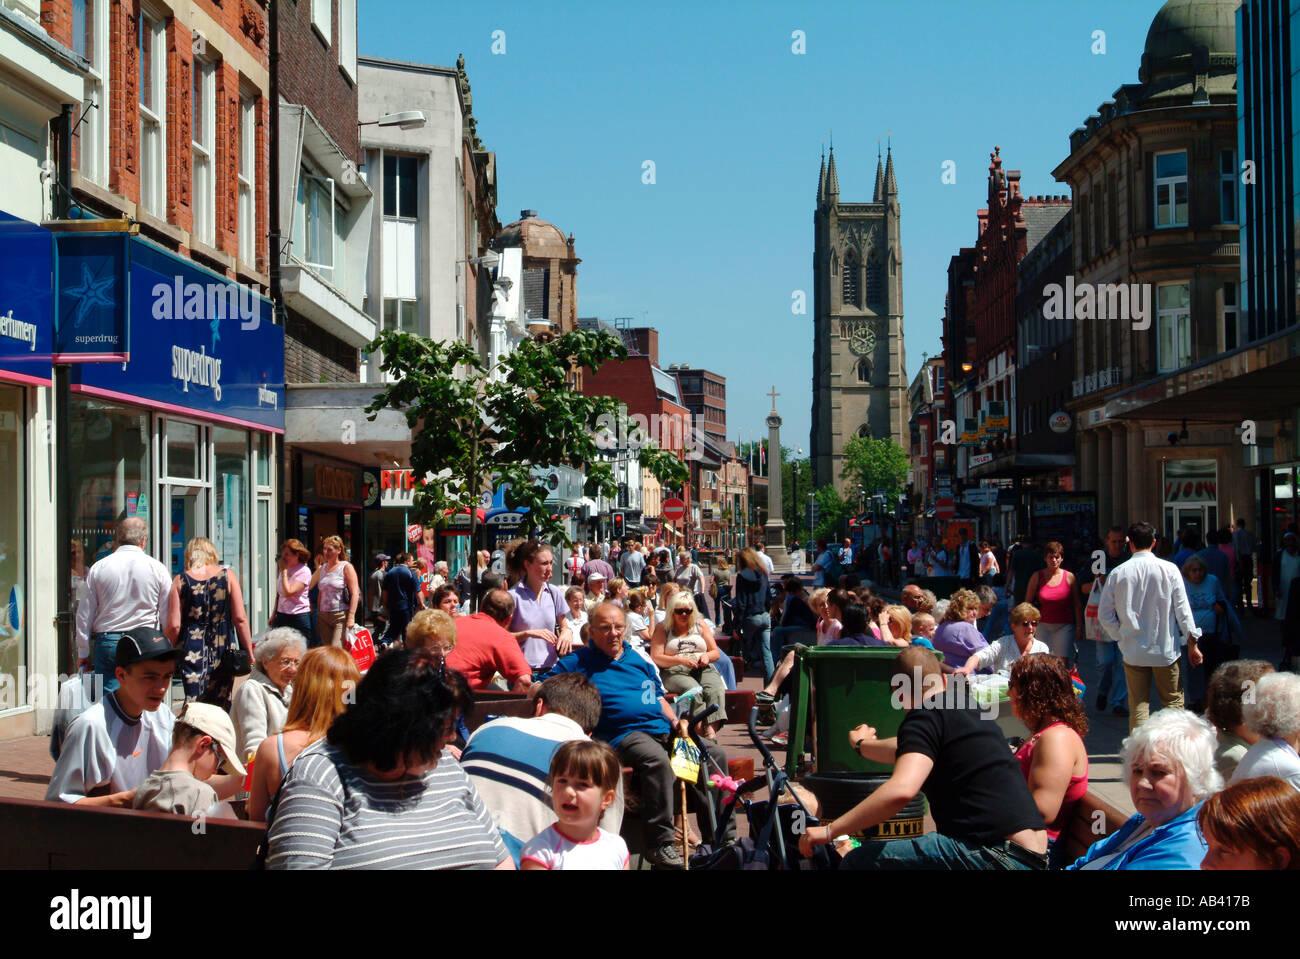 Bolton town centre England UK - Stock Image